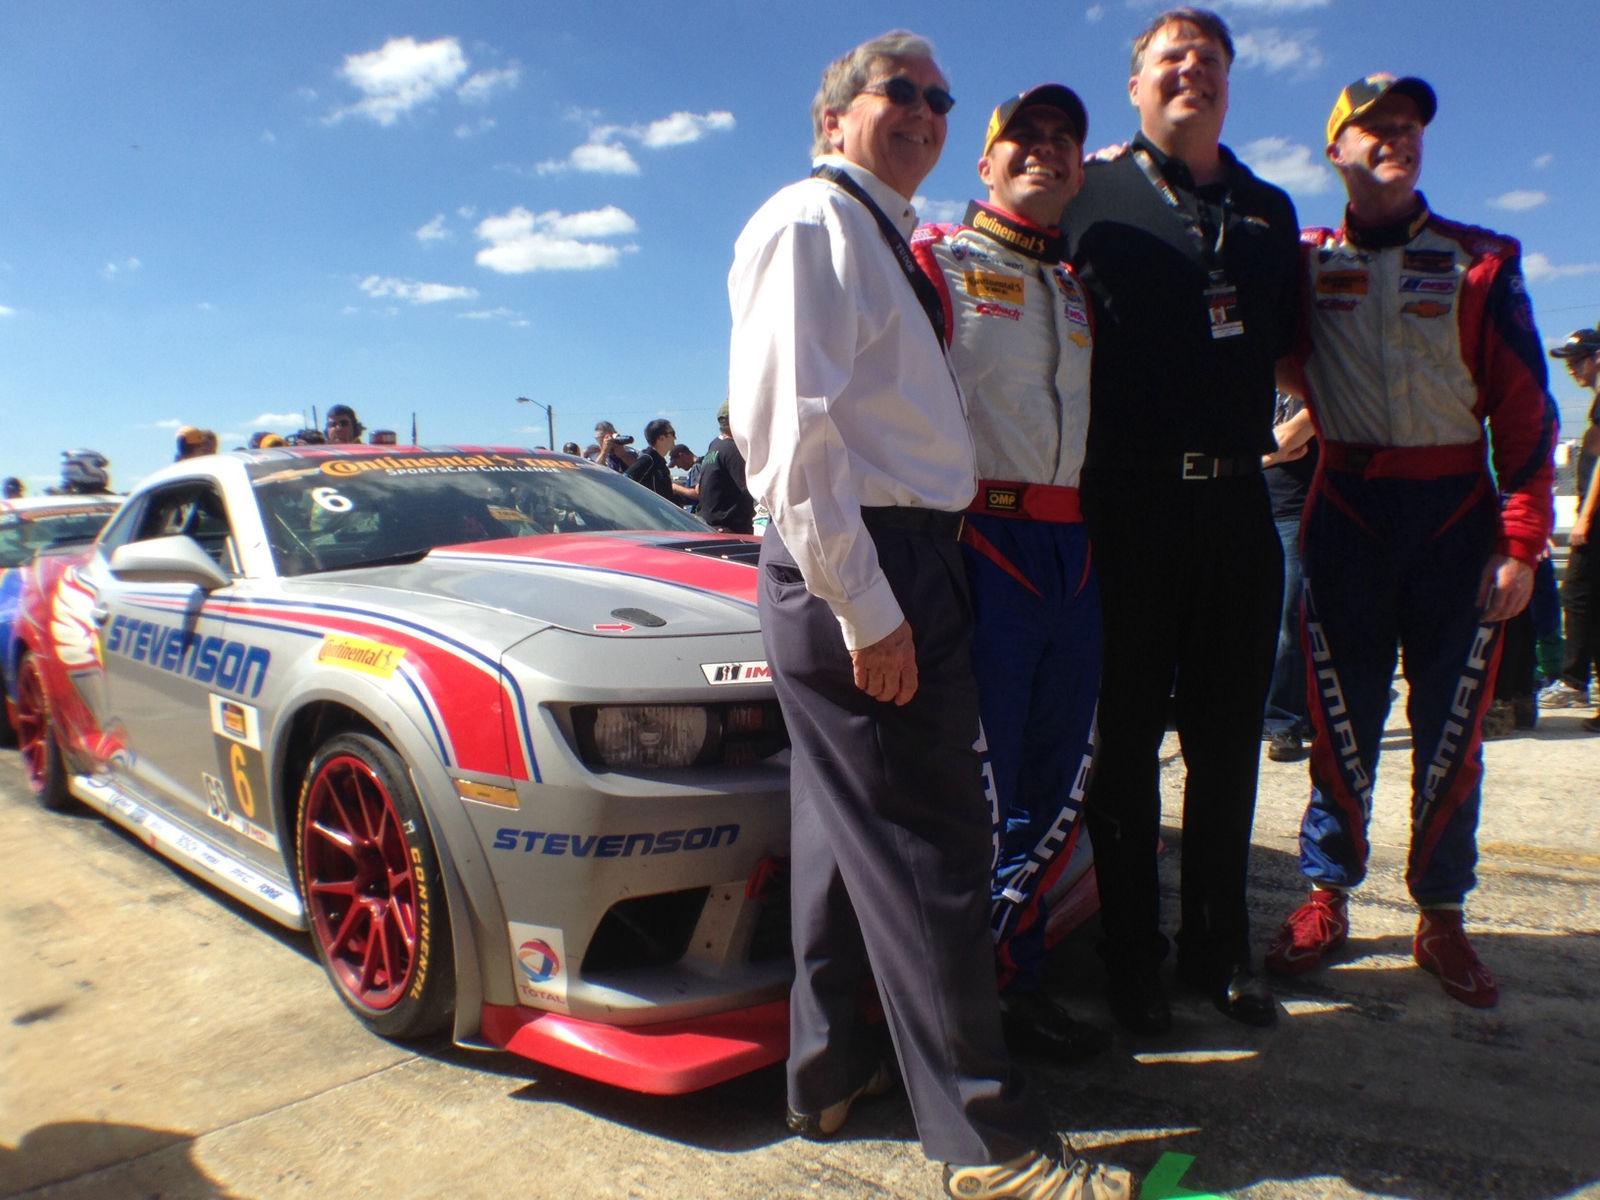 2014 Chevrolet Camaro | Stevenson Motorsports #6 GS Camaro Wins Sebring on Forgeline GS1R Wheels